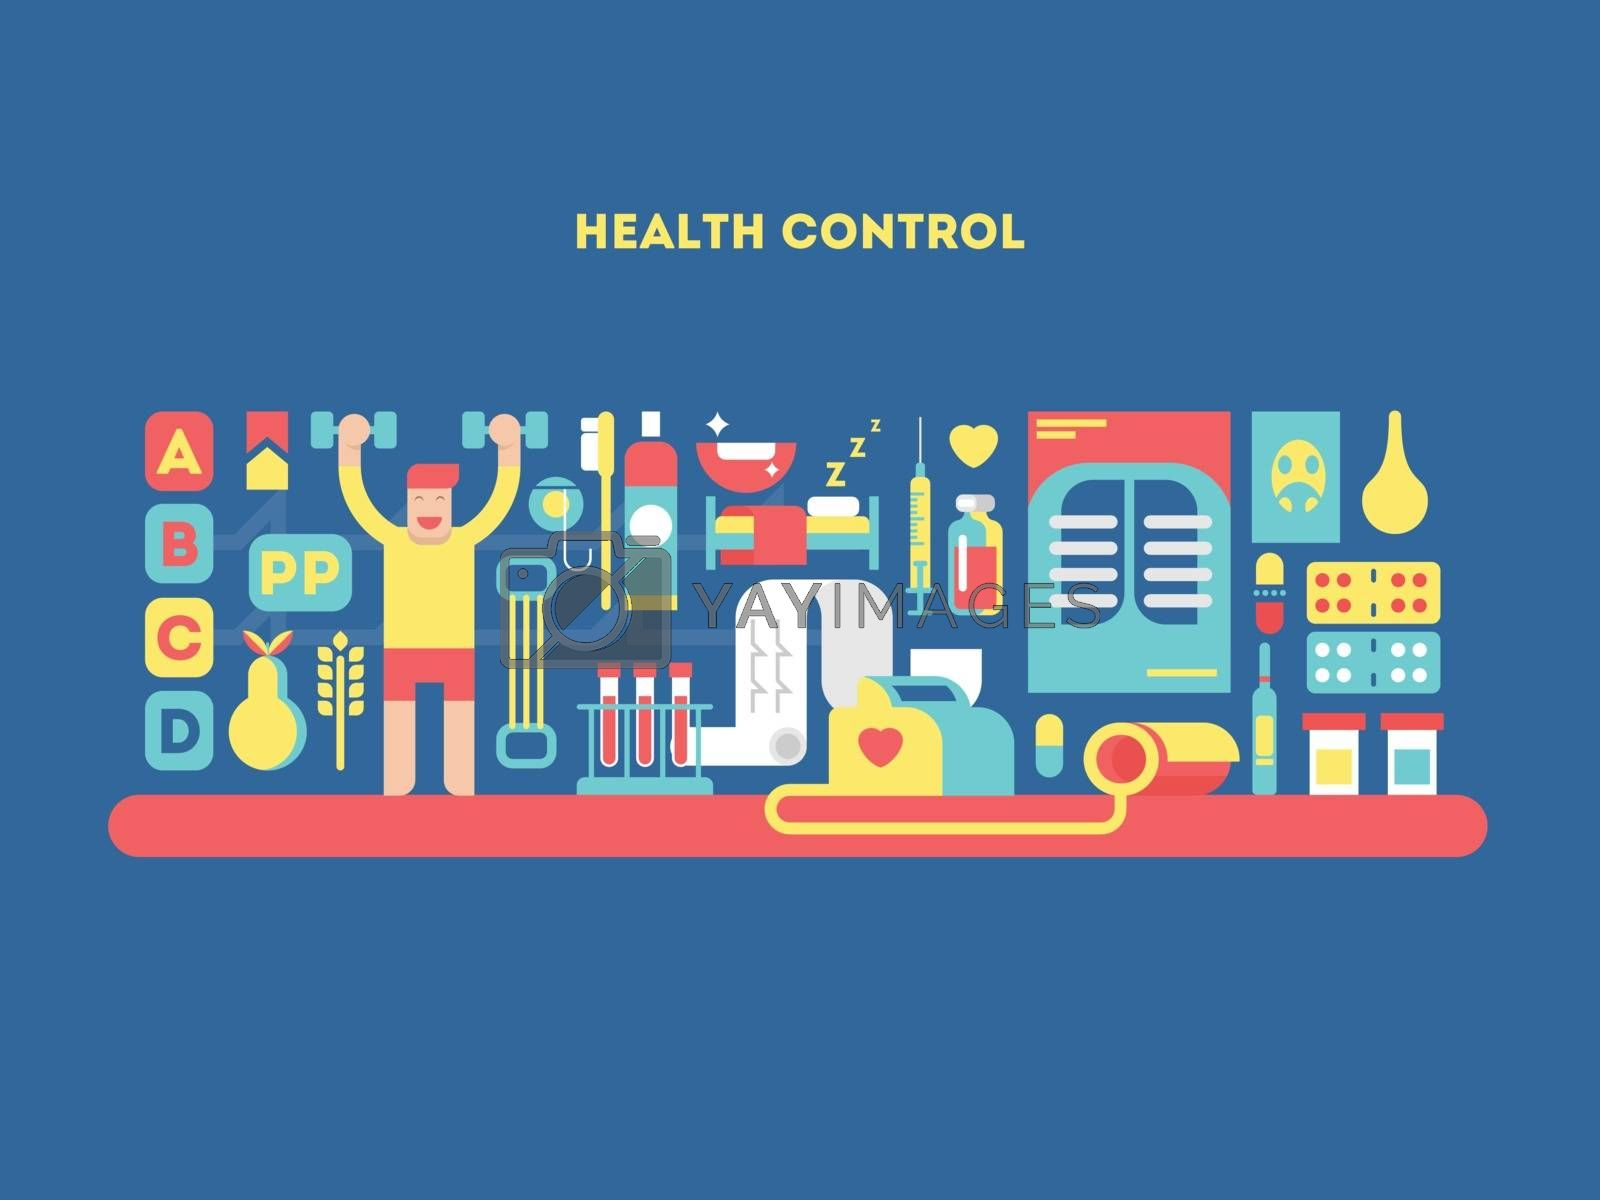 Health control design concept. Care healthcare, medicine healthy technology, vector illustration